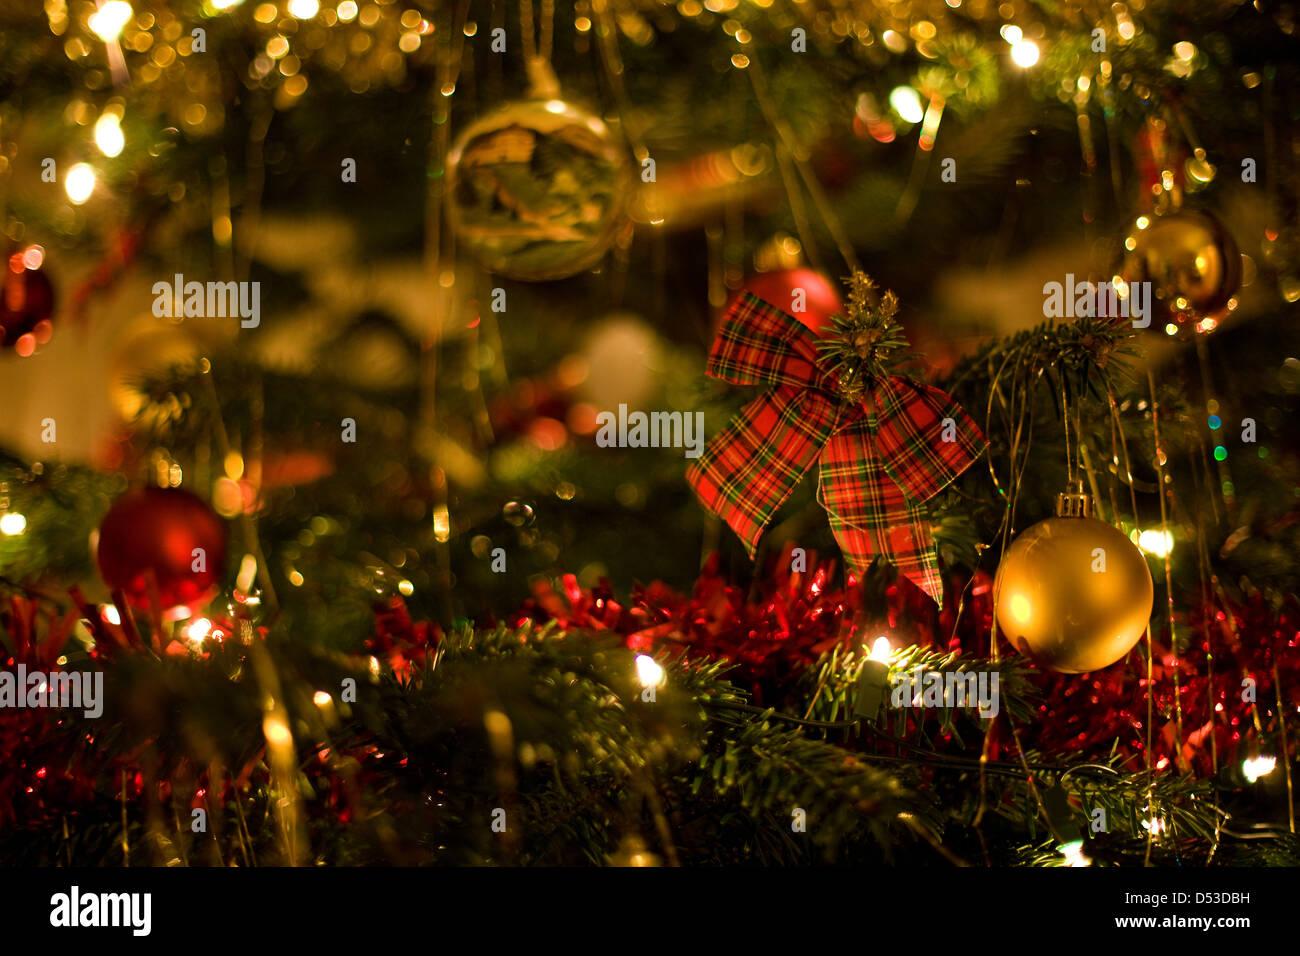 Scottish Party Decorations